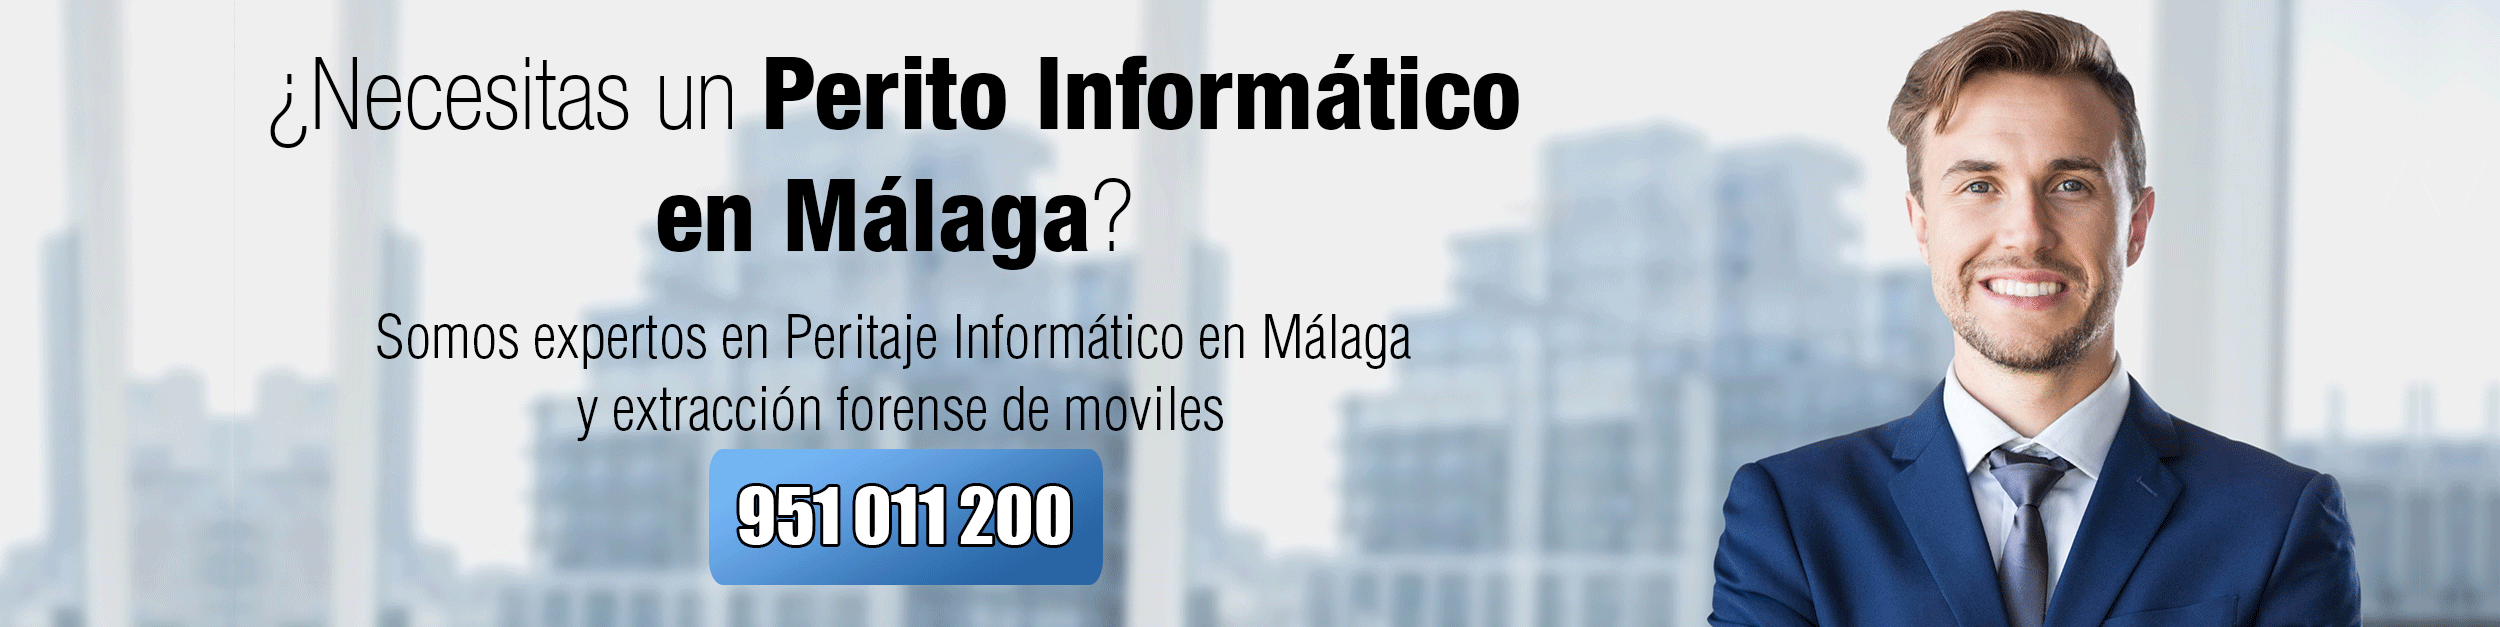 Perito Informático Málaga